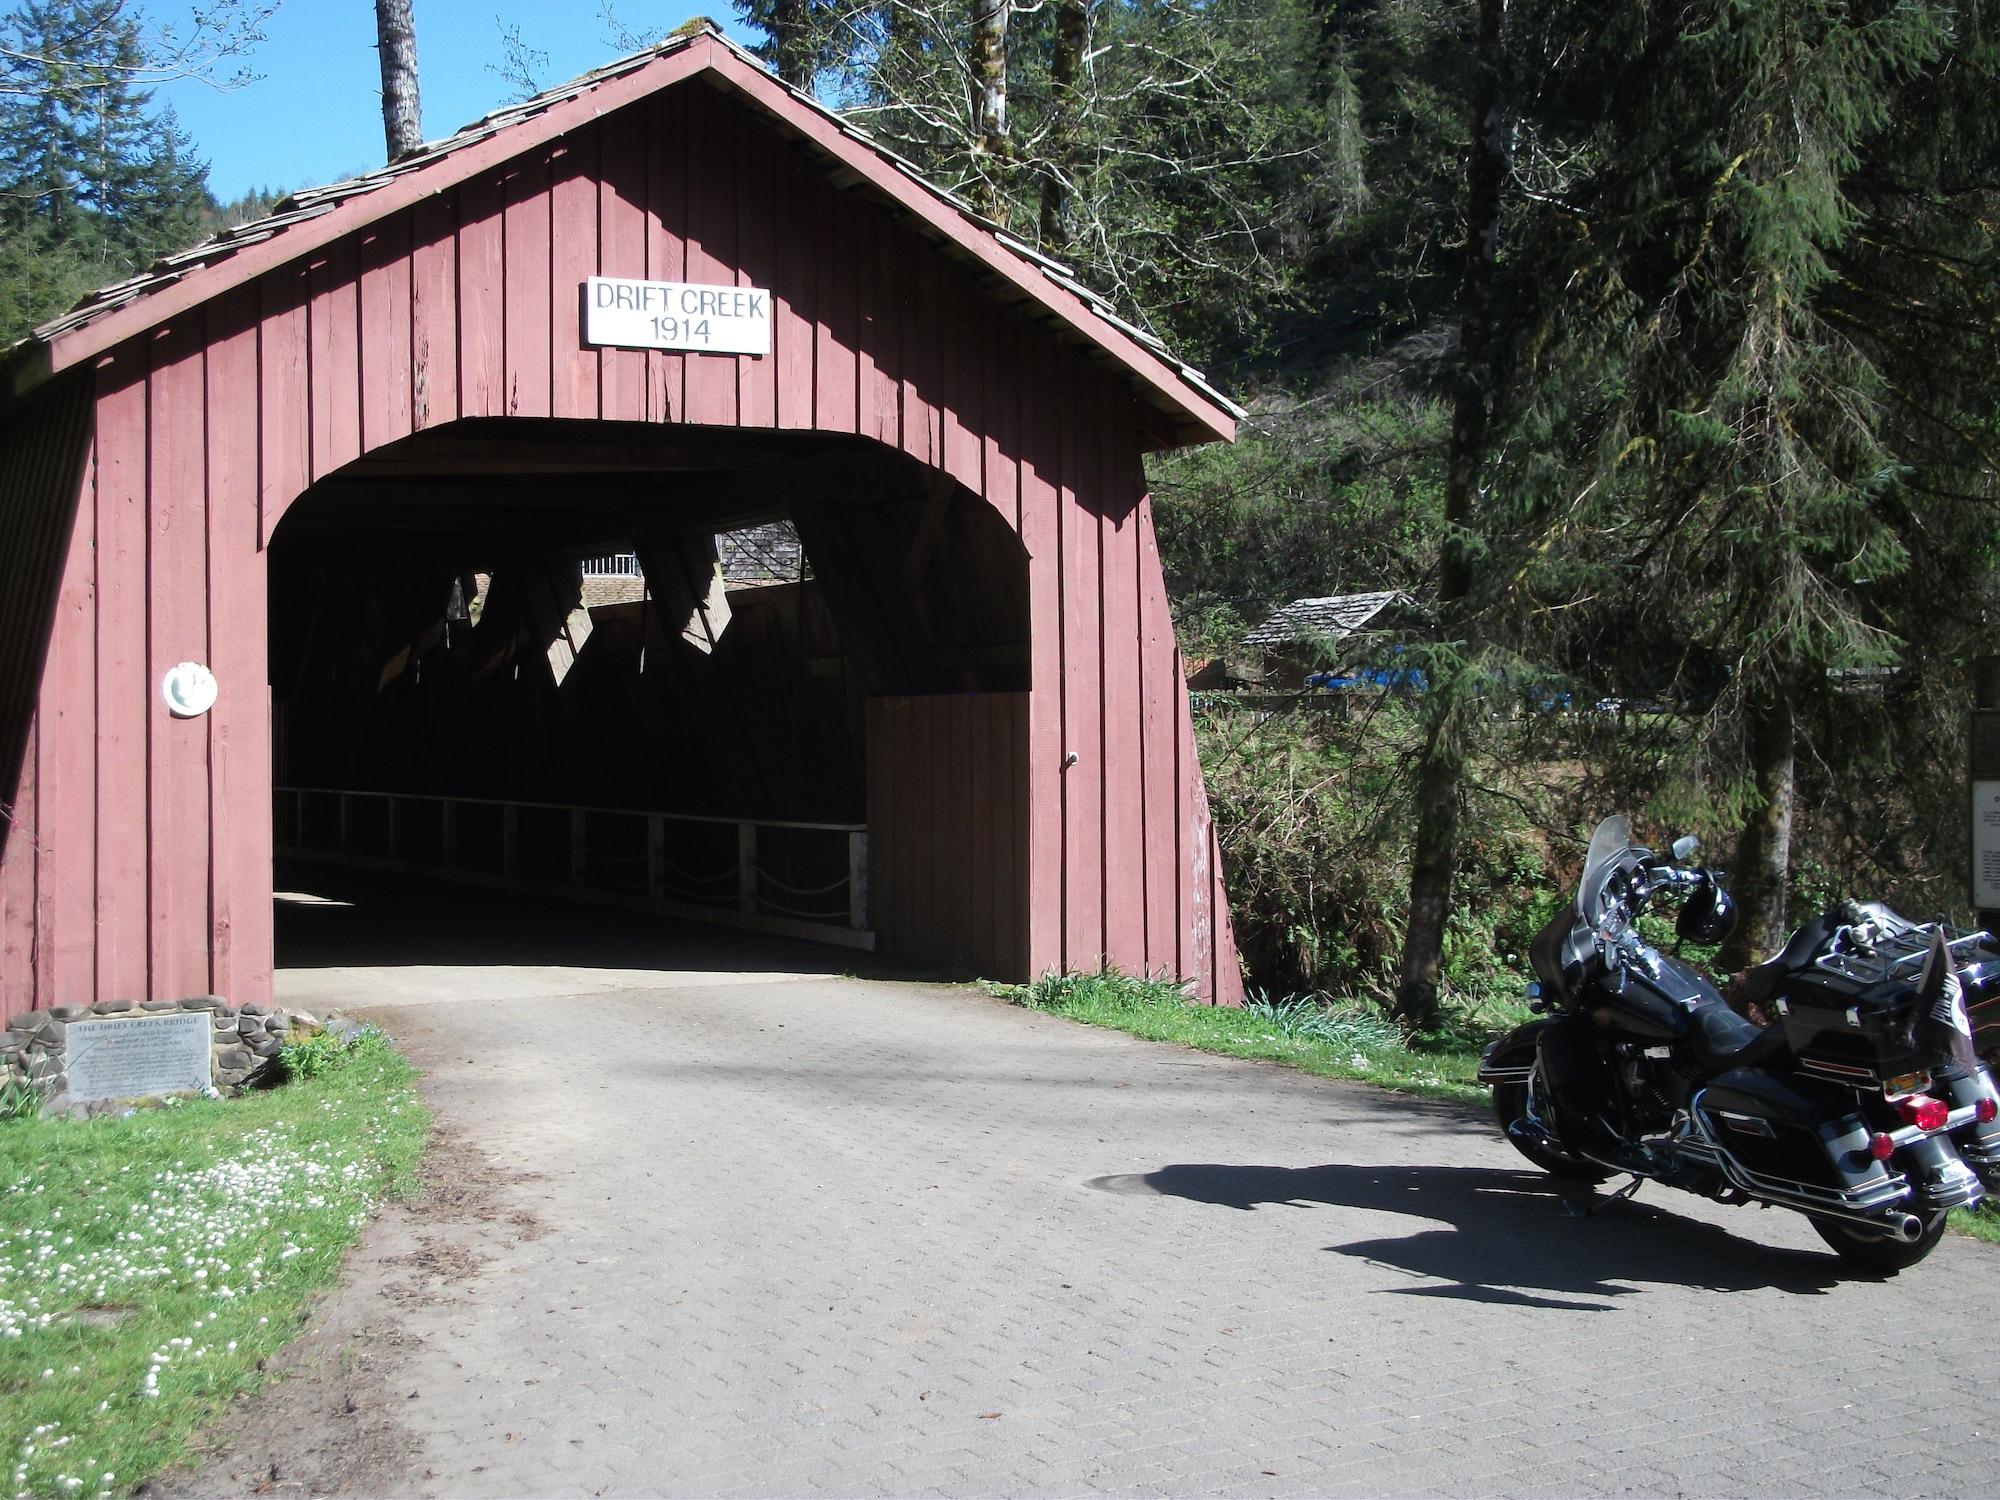 Bridges of Lincoln County-dscf2700.jpg